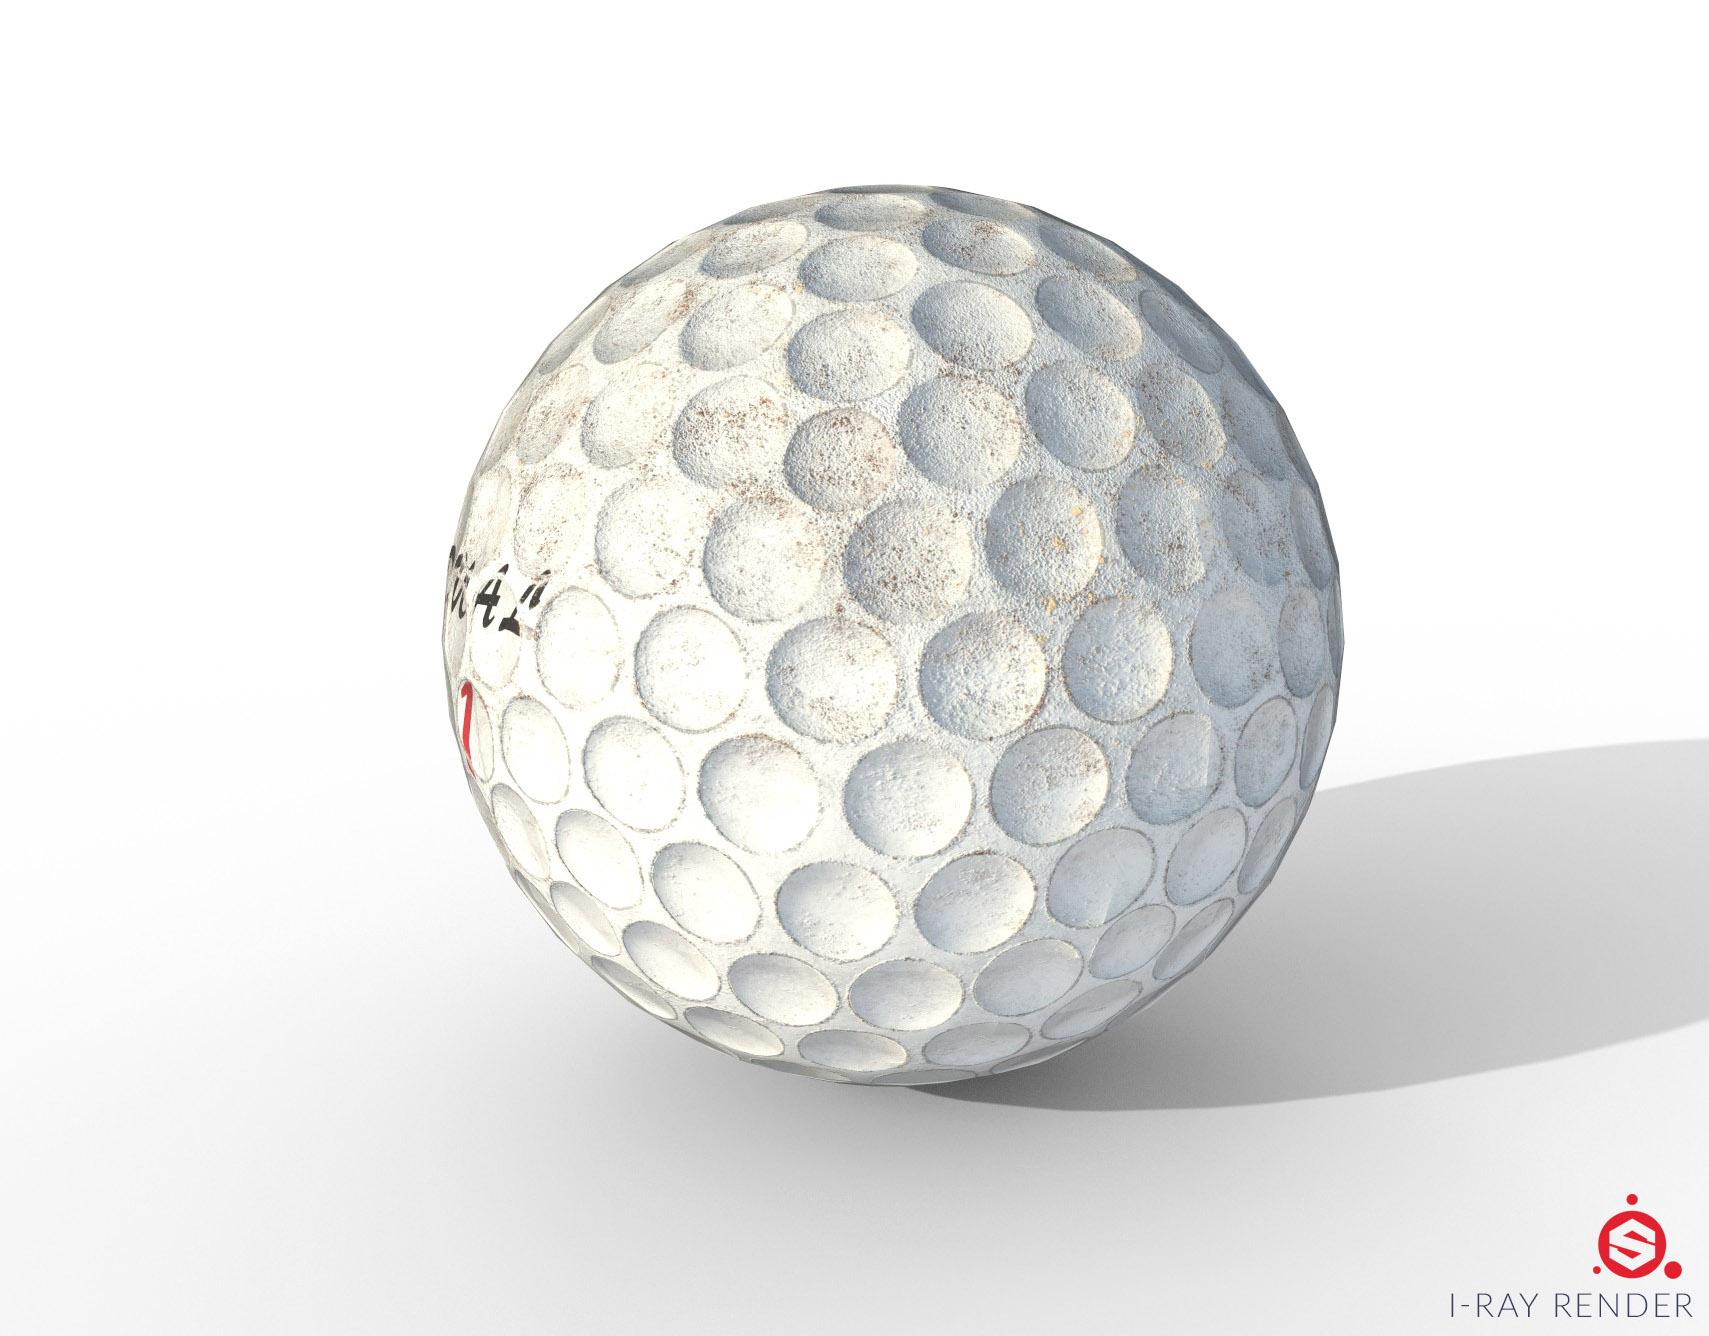 Golf ball anatomy